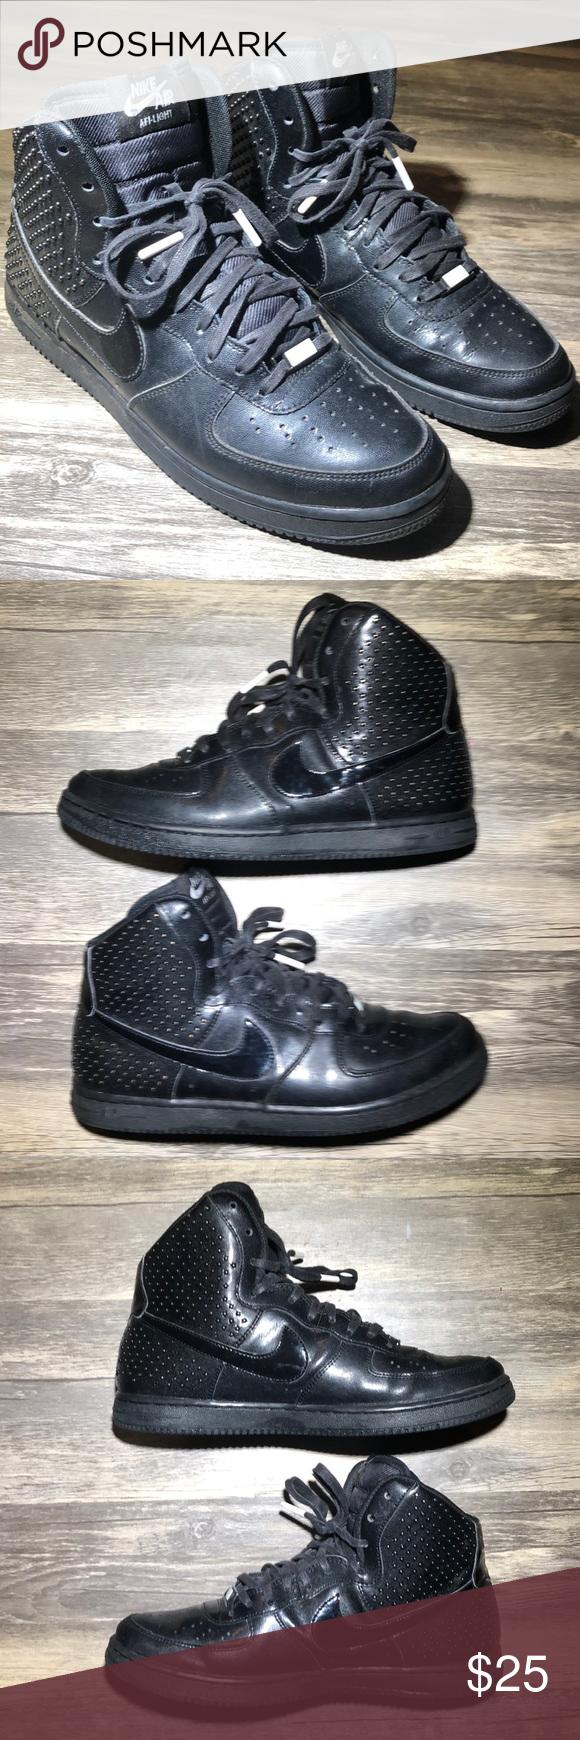 Polémico manual Minimizar  Nike Air AFI-Light Black High Top Studded Sneaker Pre-owned (no box) Nike  Air AFI-Light Size 9 Women's Model … | Studded sneakers, Black high tops,  Dress shoes men